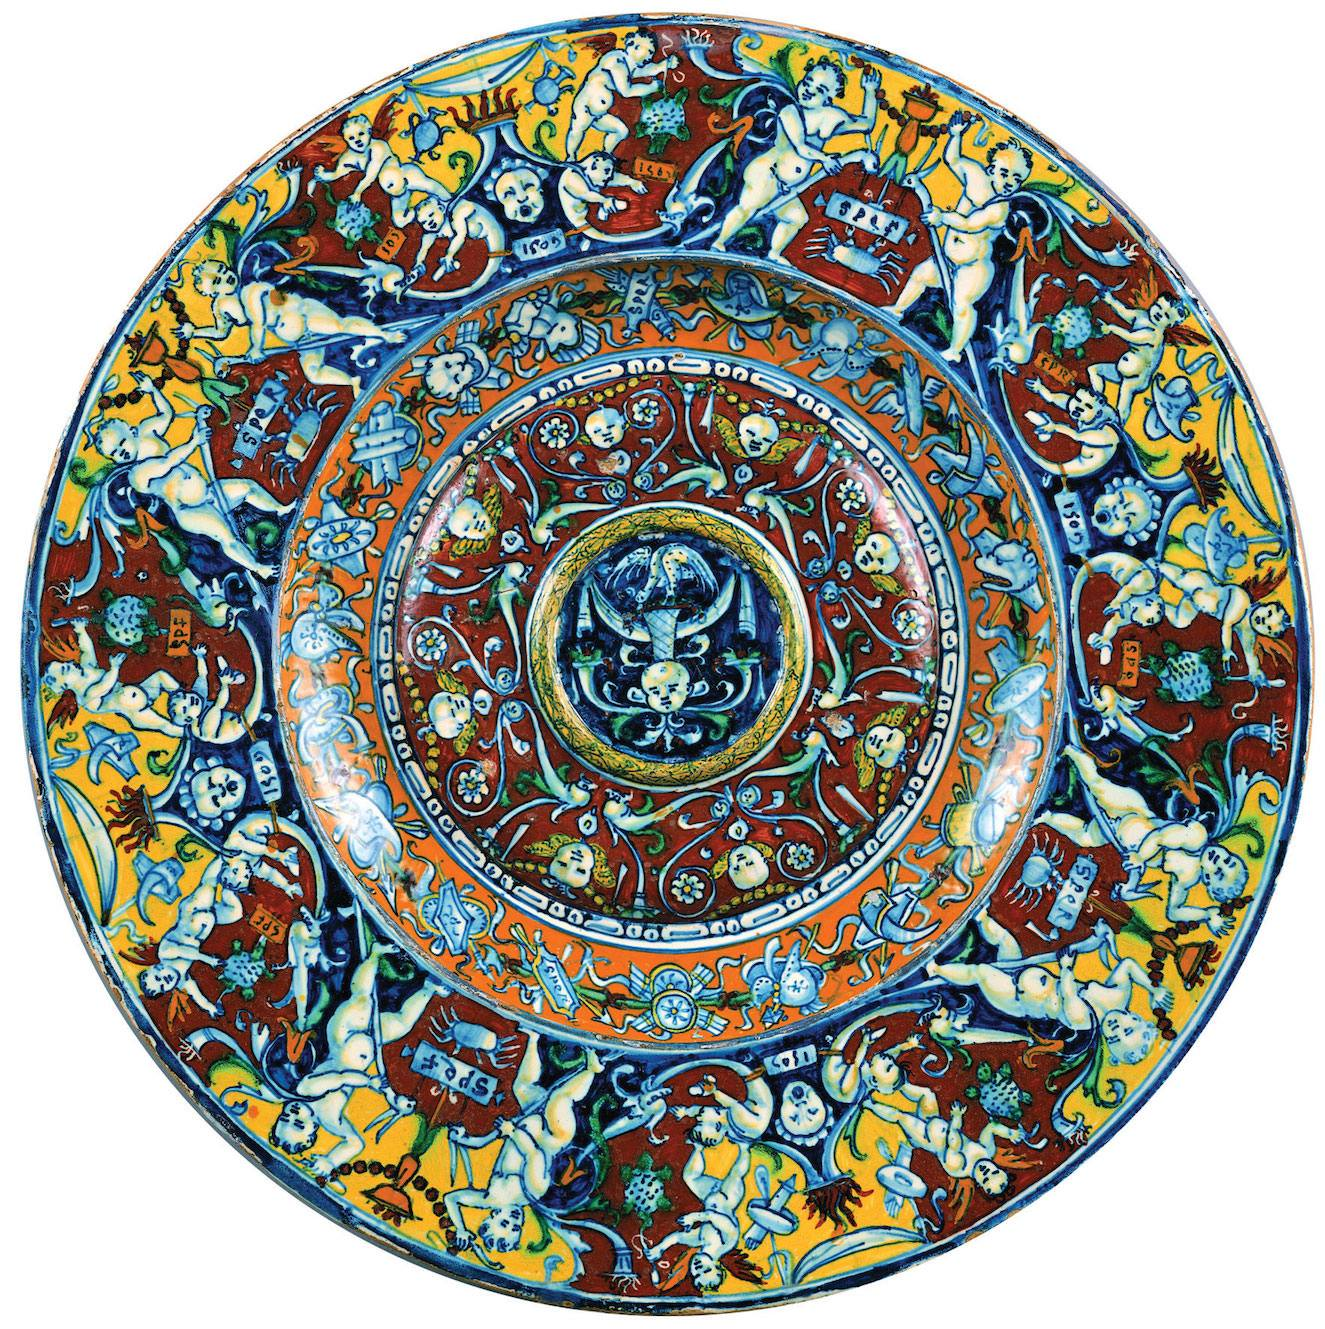 Ceramiche Toscane Montelupo Fiorentino museum of ceramics in montelupo fiorentino   visit tuscany